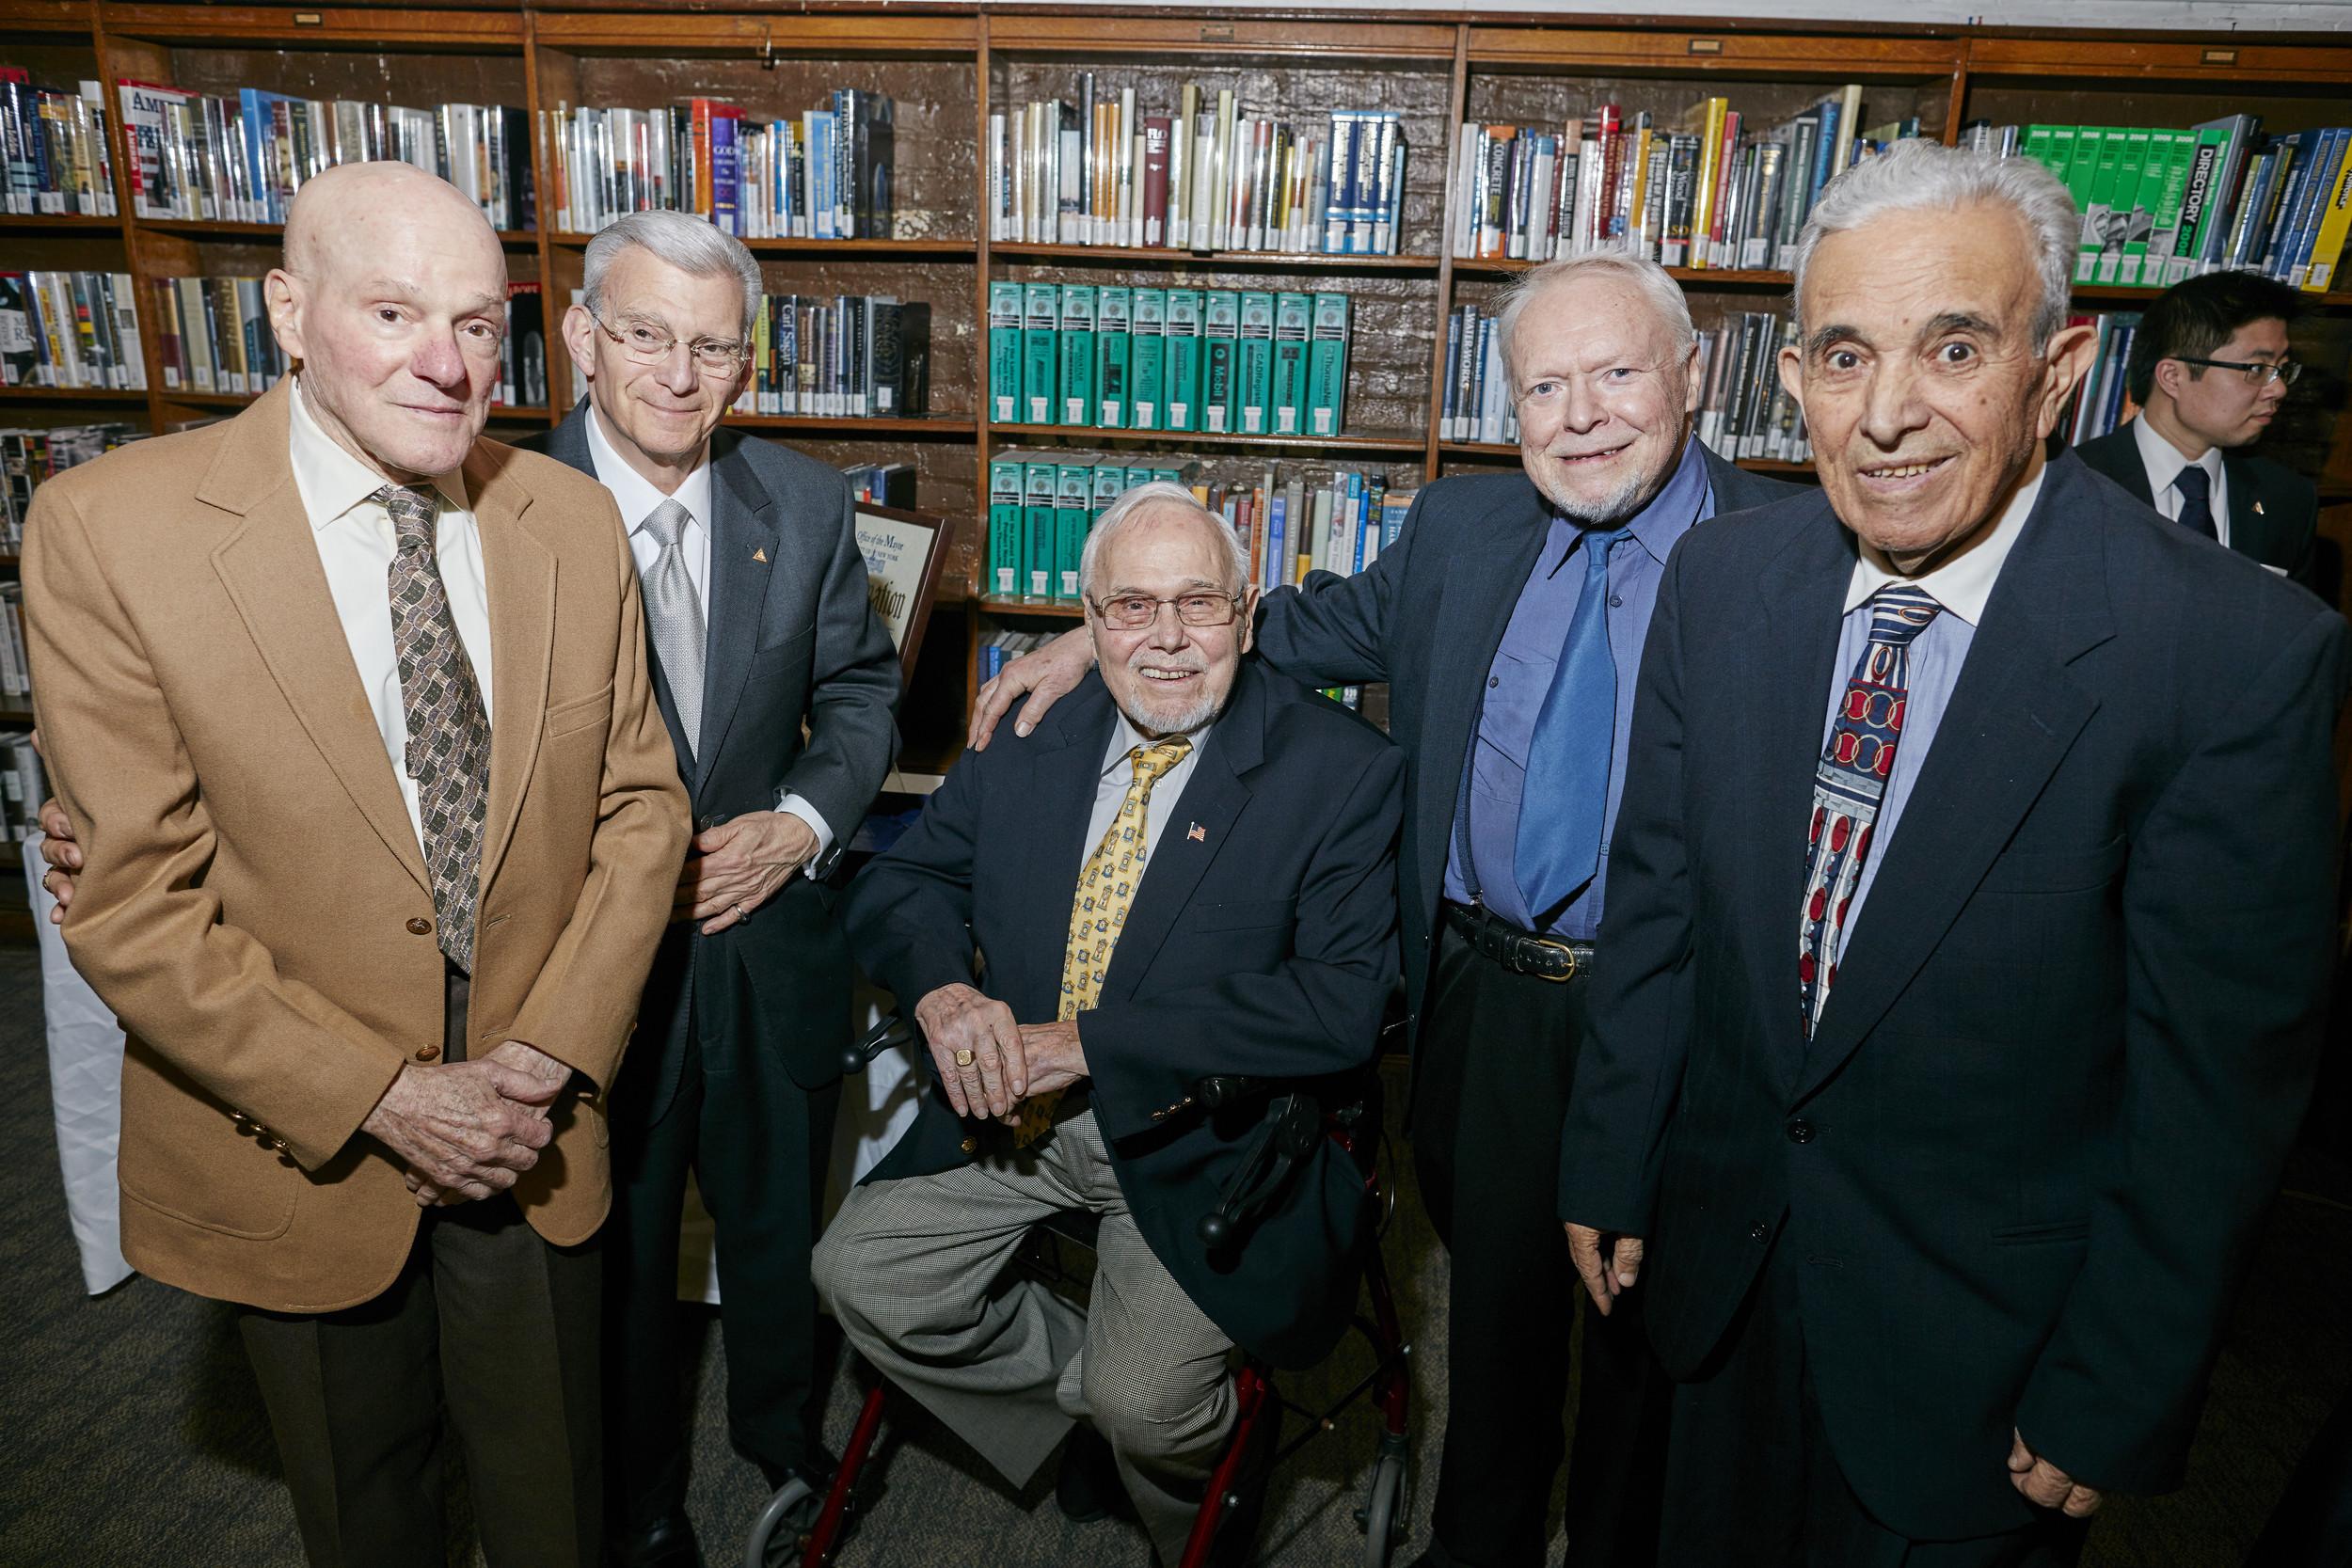 Left to right: Joe Poloso - Fellow, Charles Salomon - Treasurer & Fellow, Hans Weber - Trustee & Fellow, Walter Pangretitsch - Recording Secretary & Fellow, Arsen Manoukian - Fellow